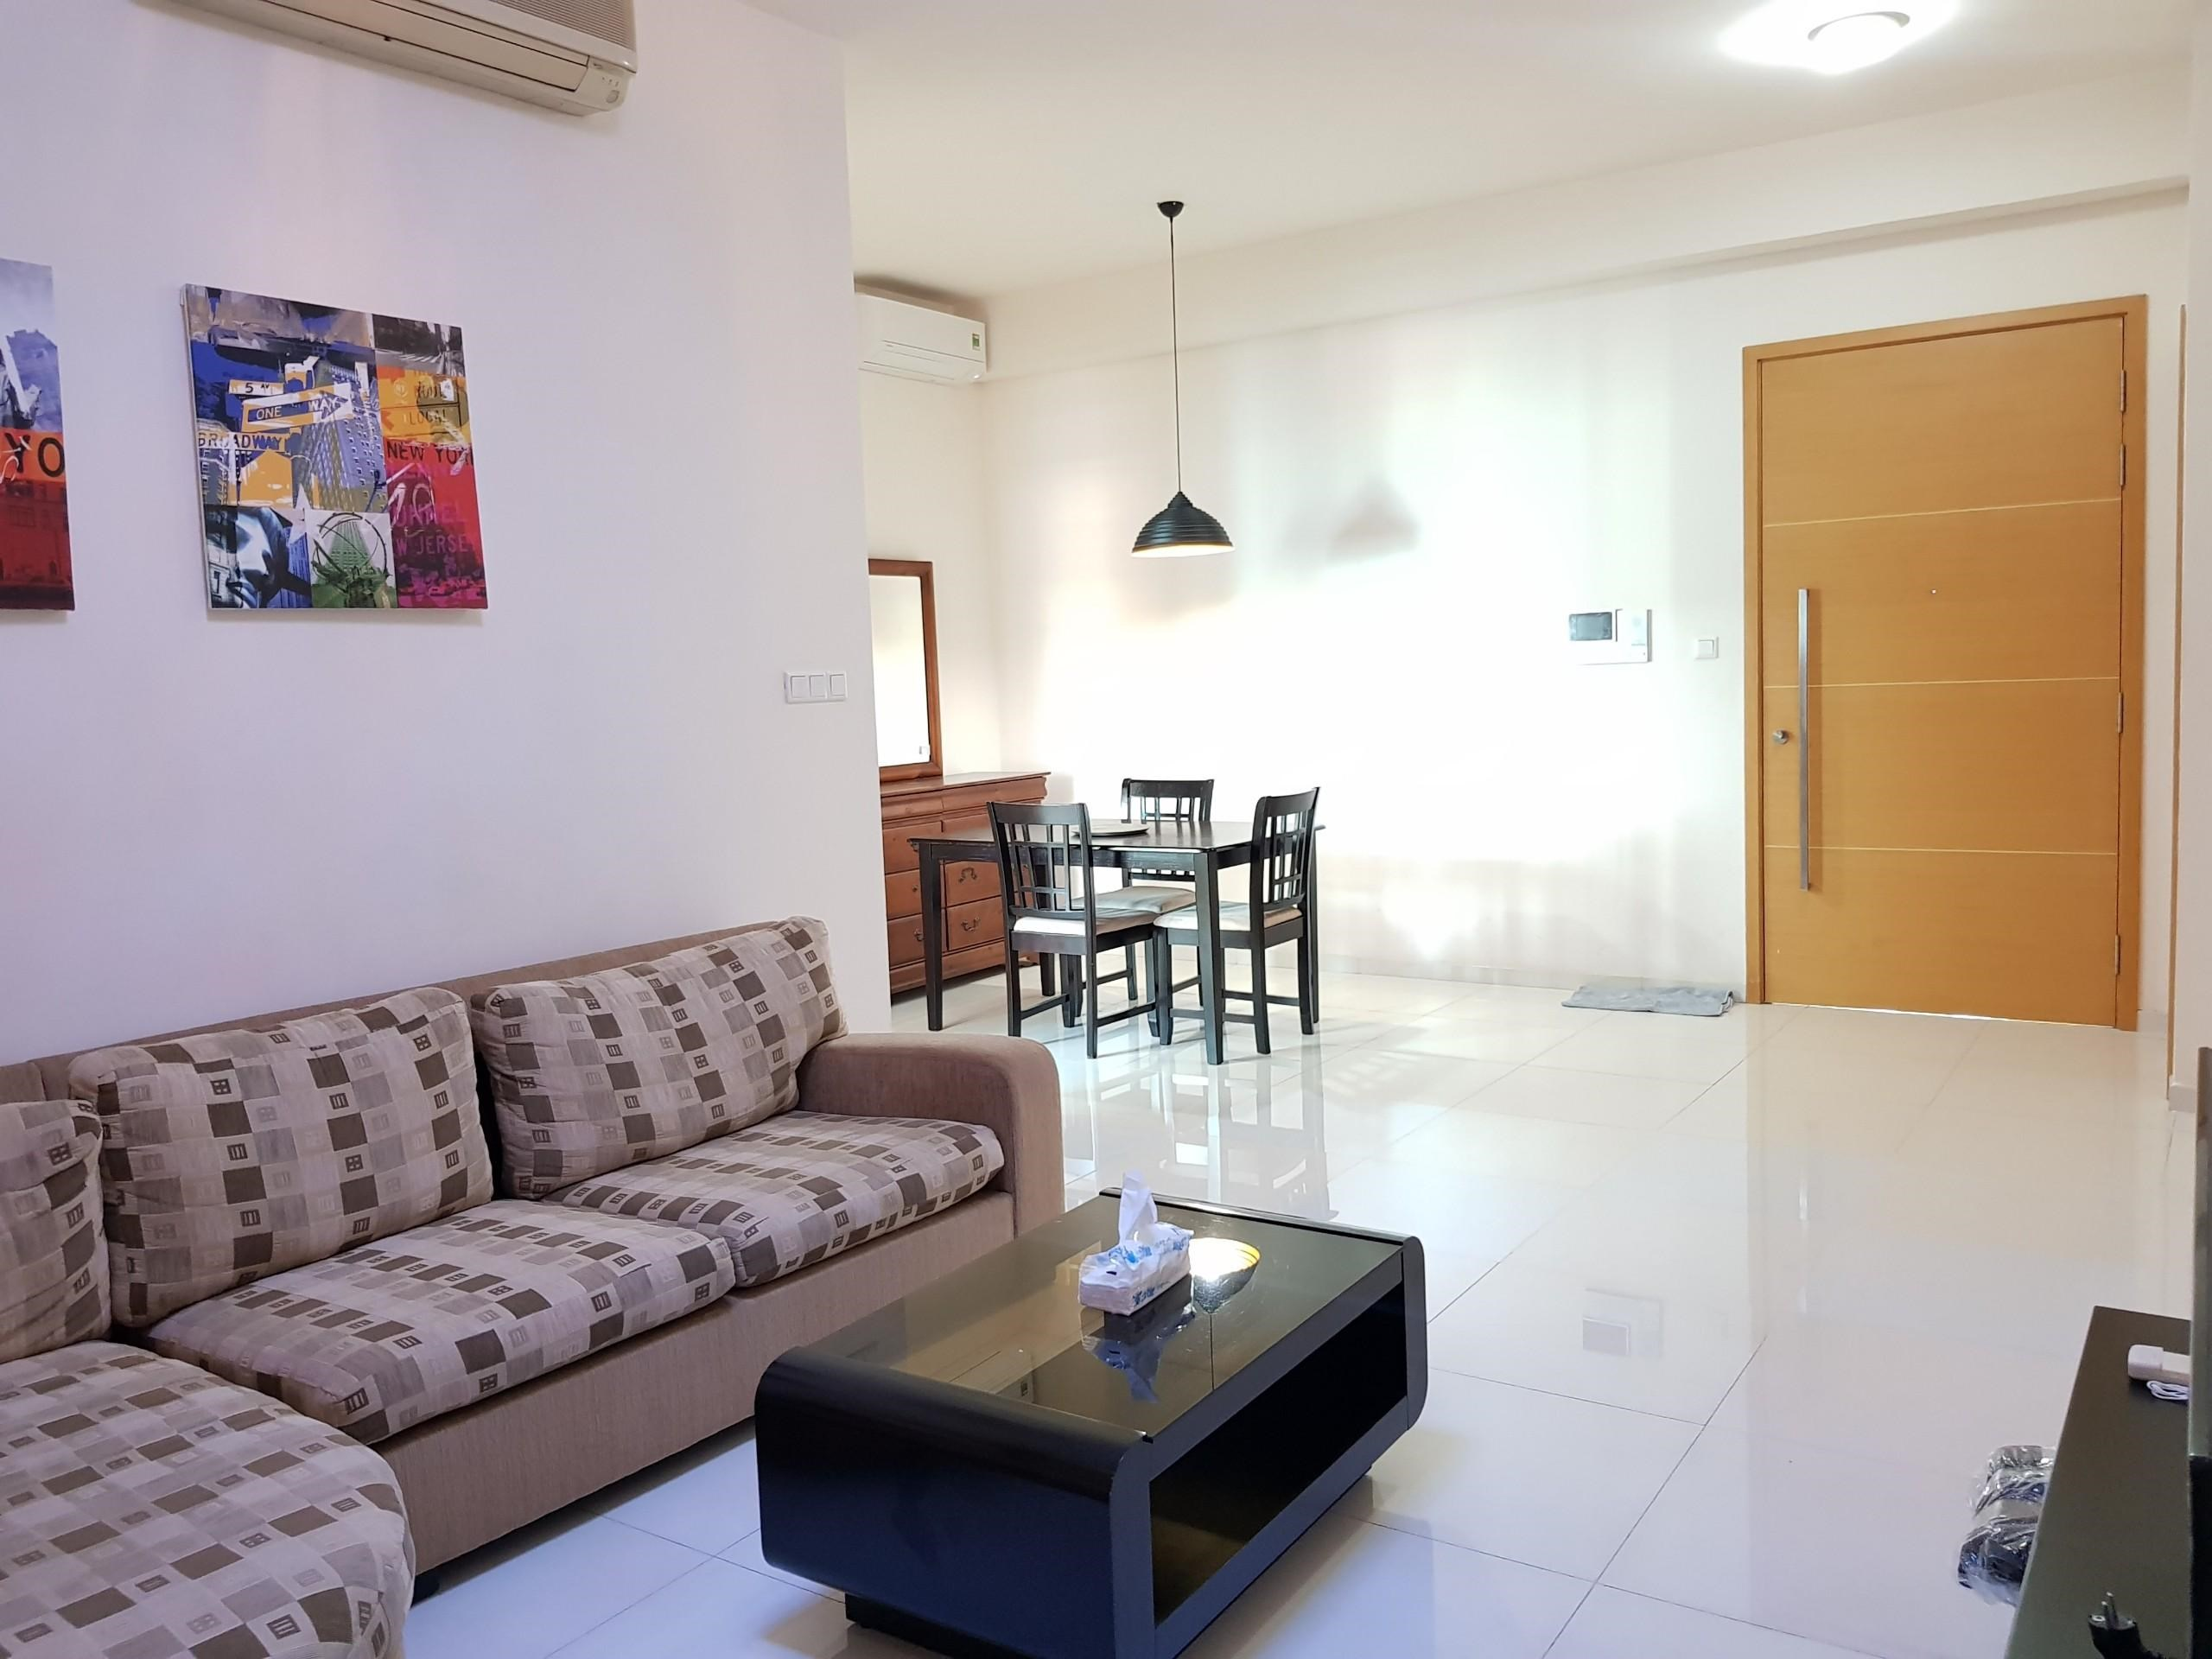 TV95291 - Apartment for rent - The Vista